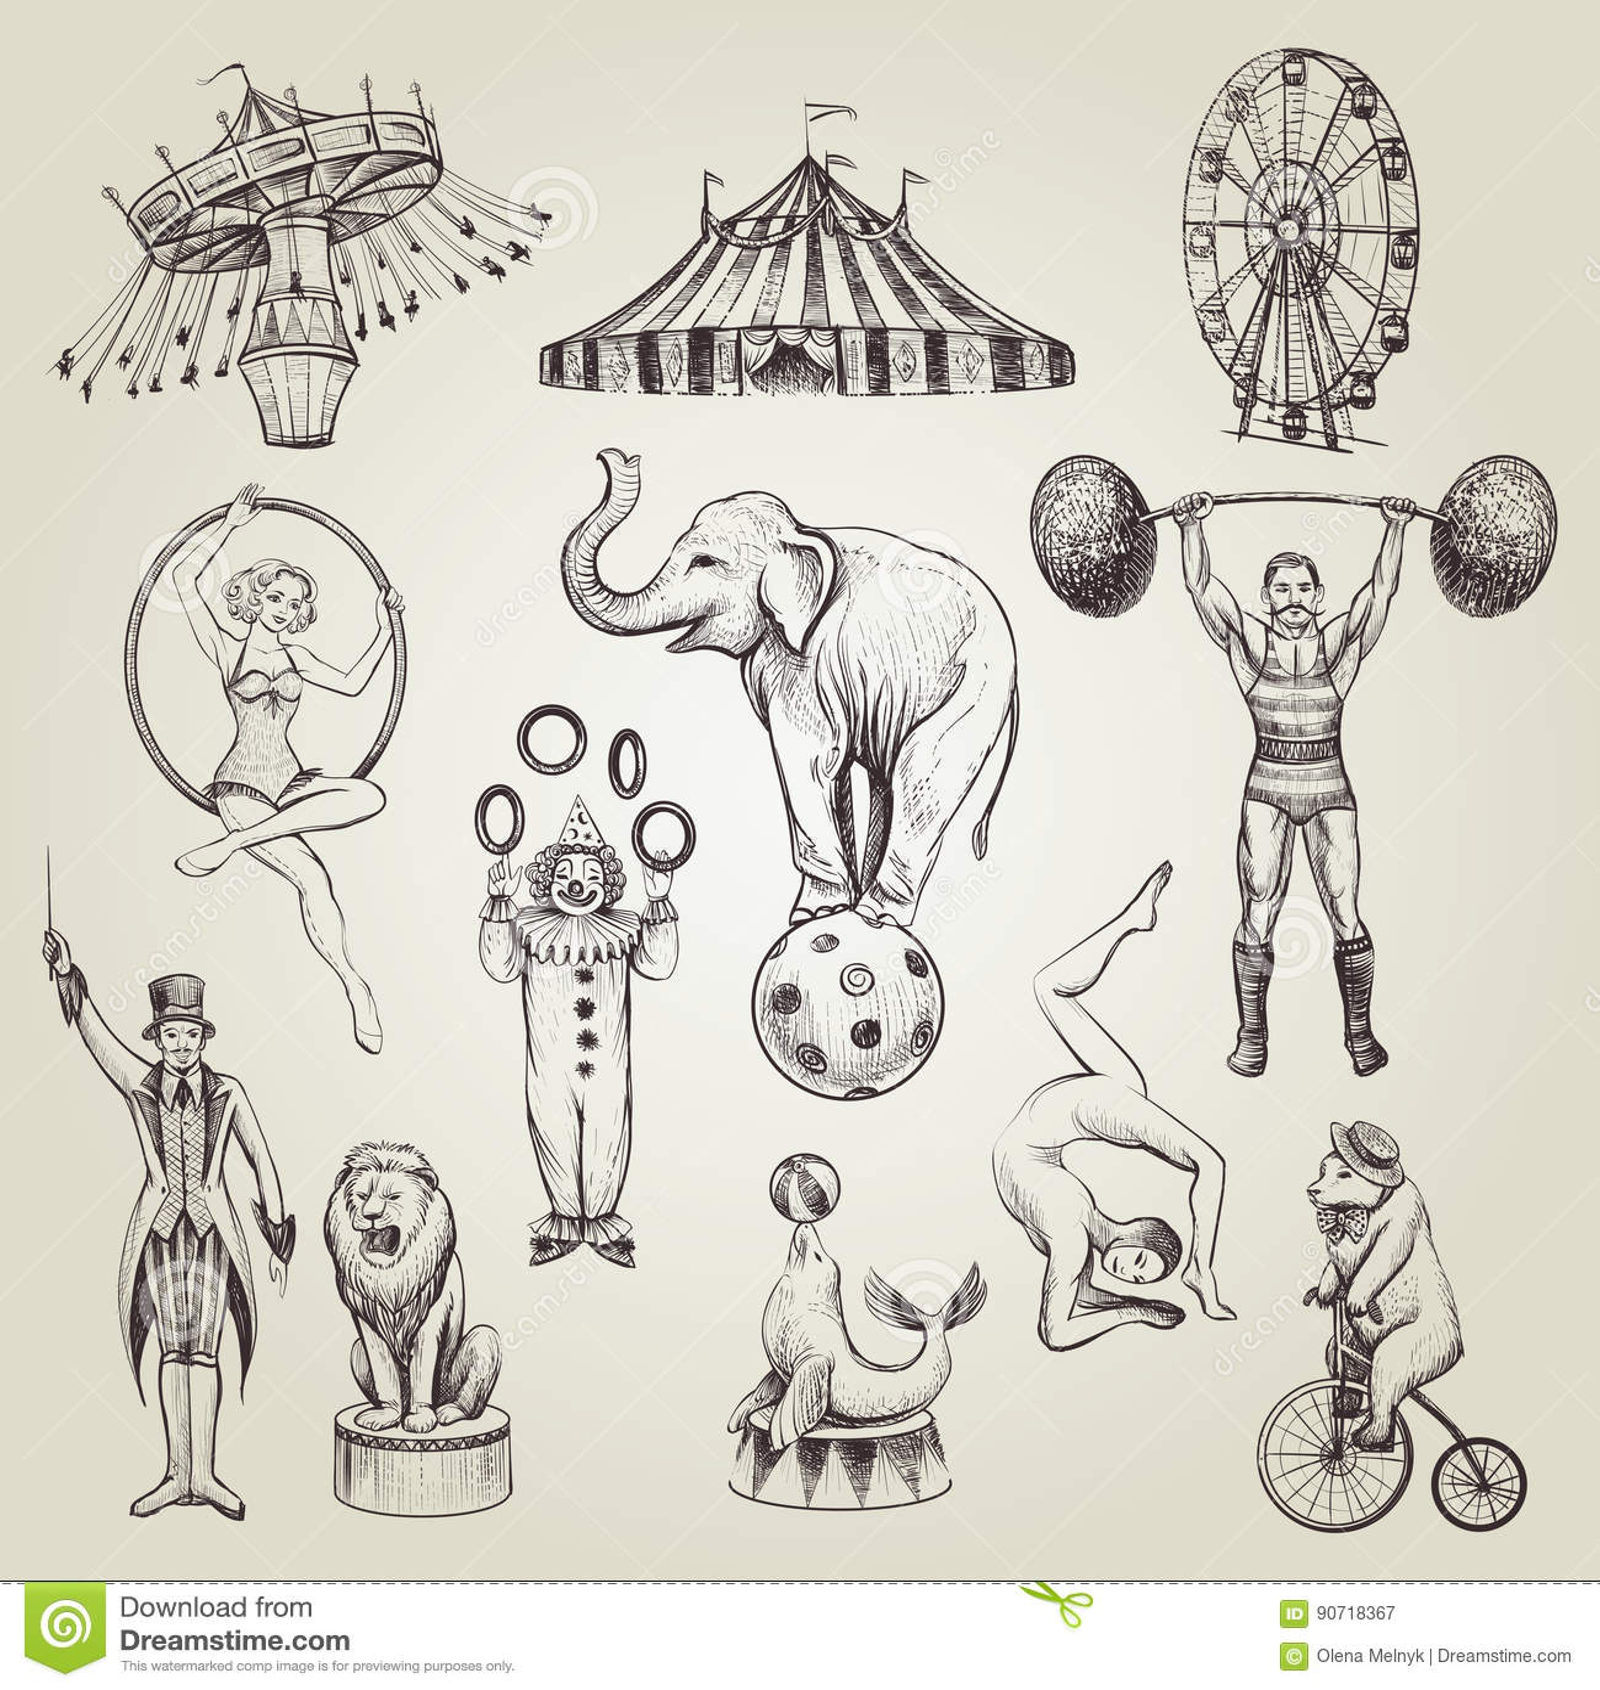 Circus Vintage Hand Drawn Vector Illustrations Set. Stock ...